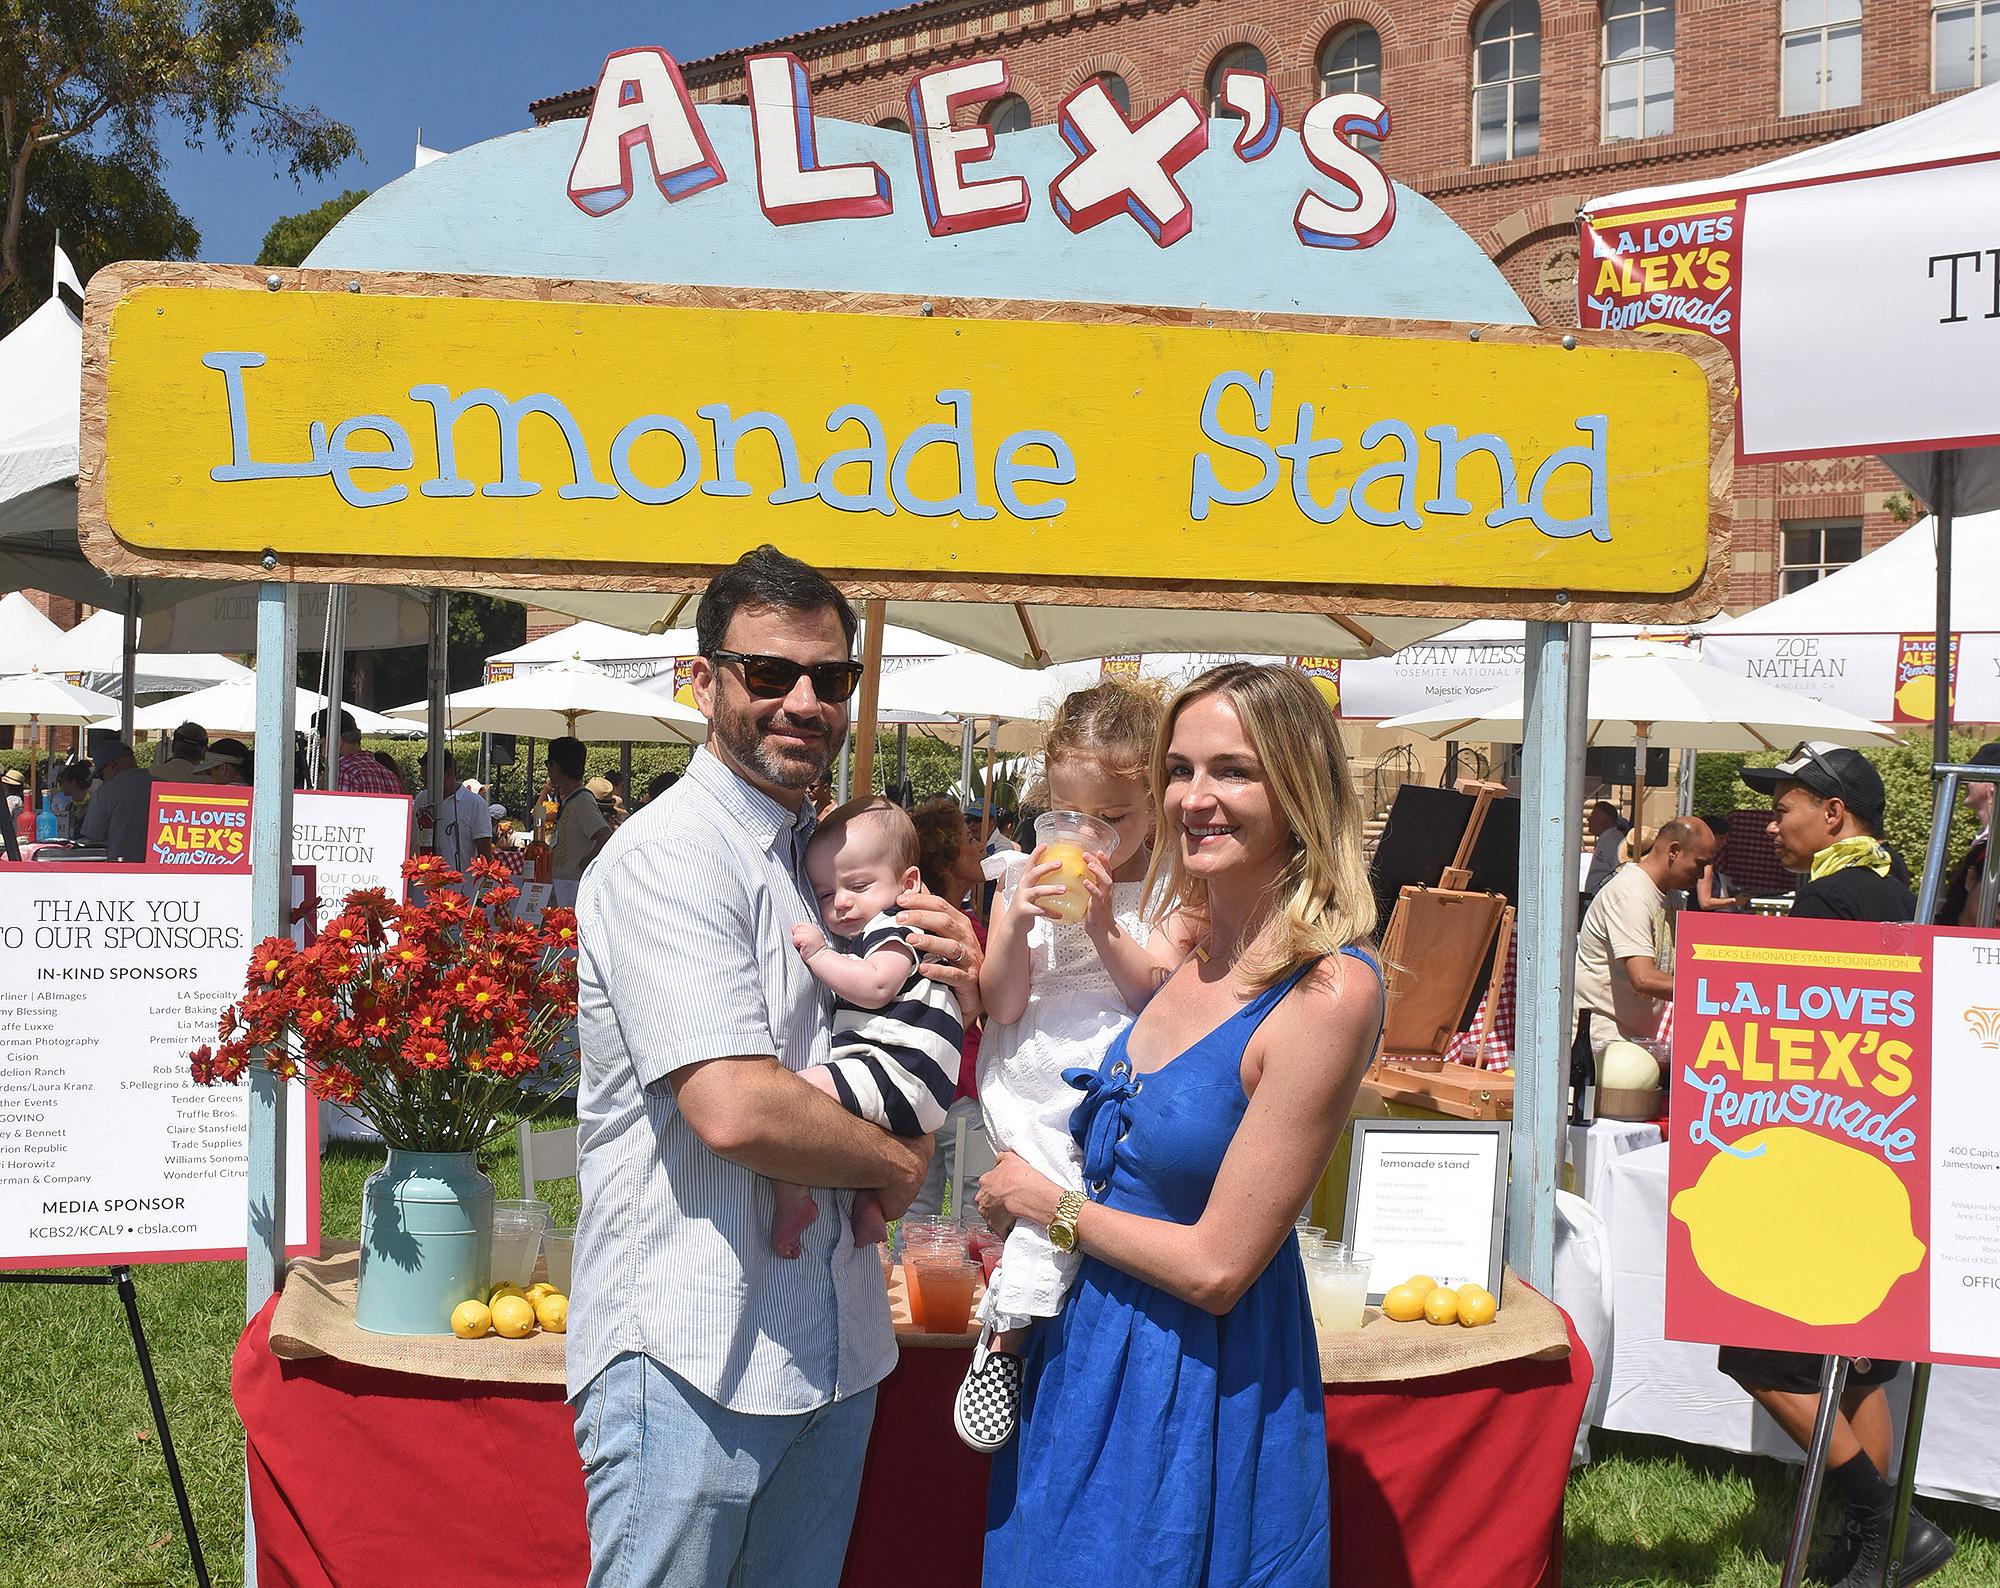 Jimmy Kimmel, Molly McNearney, Jane Kimmel, William Kimmel, L.A. Loves Alexs Lemonade, Childhood Cancer